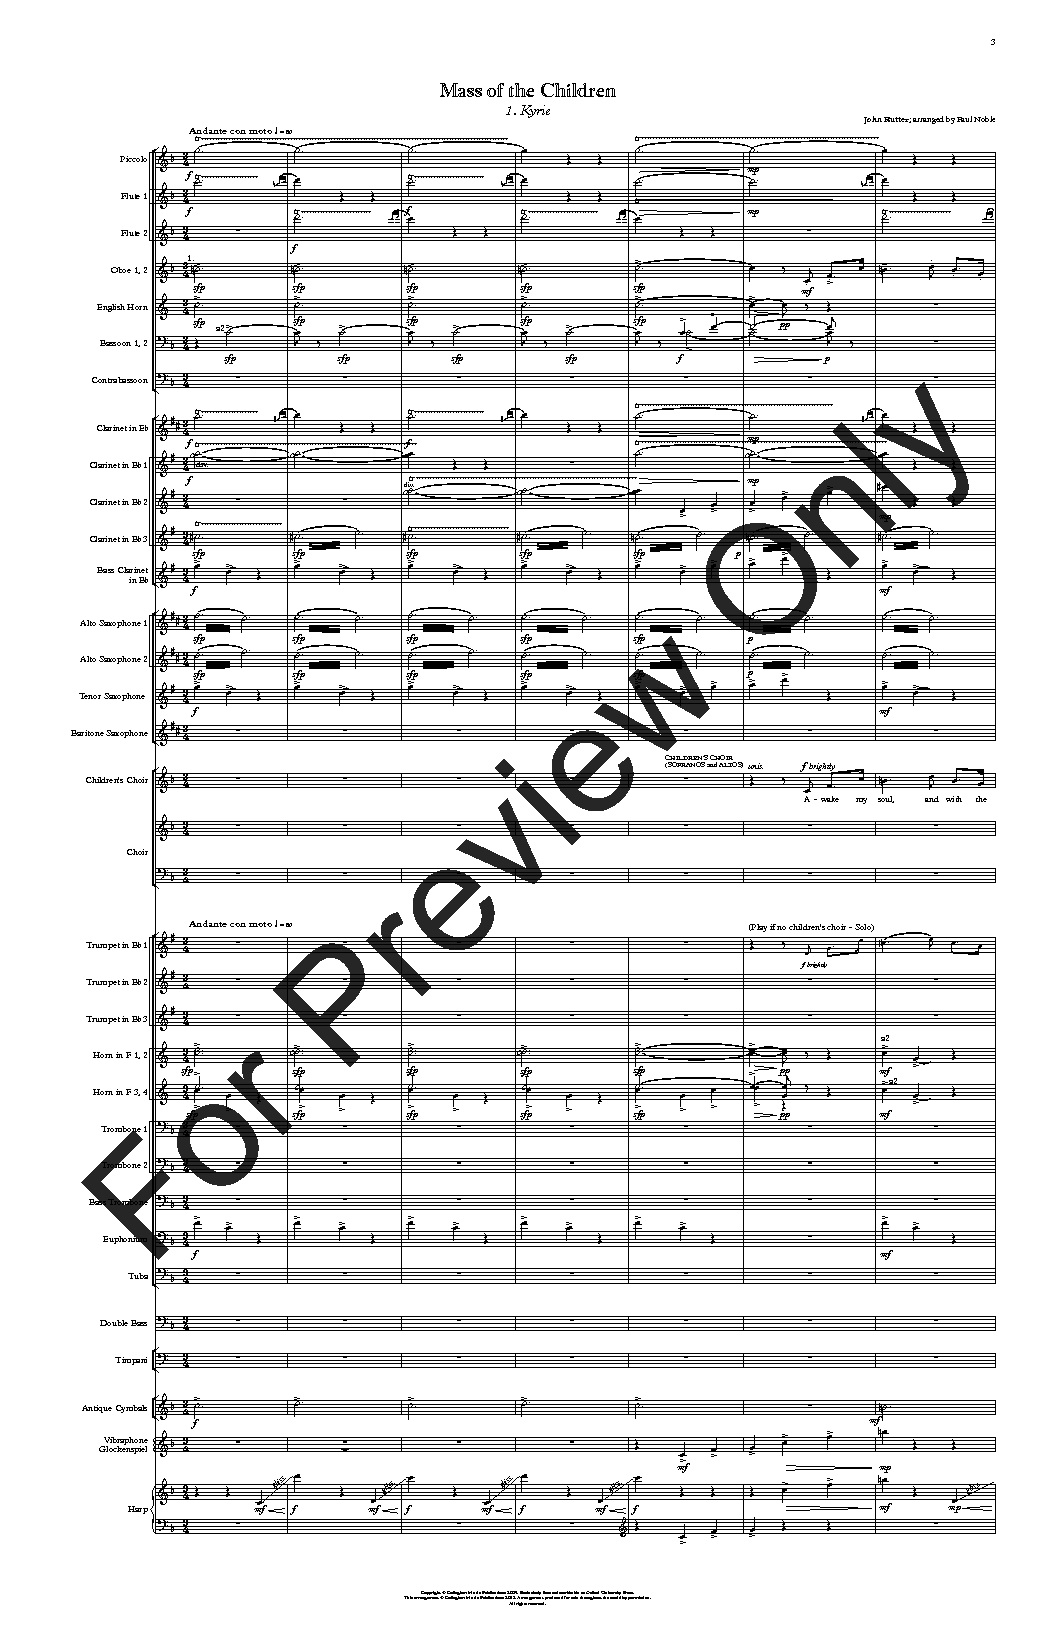 Mass of the Children (Complete) by John Rutter / | J W